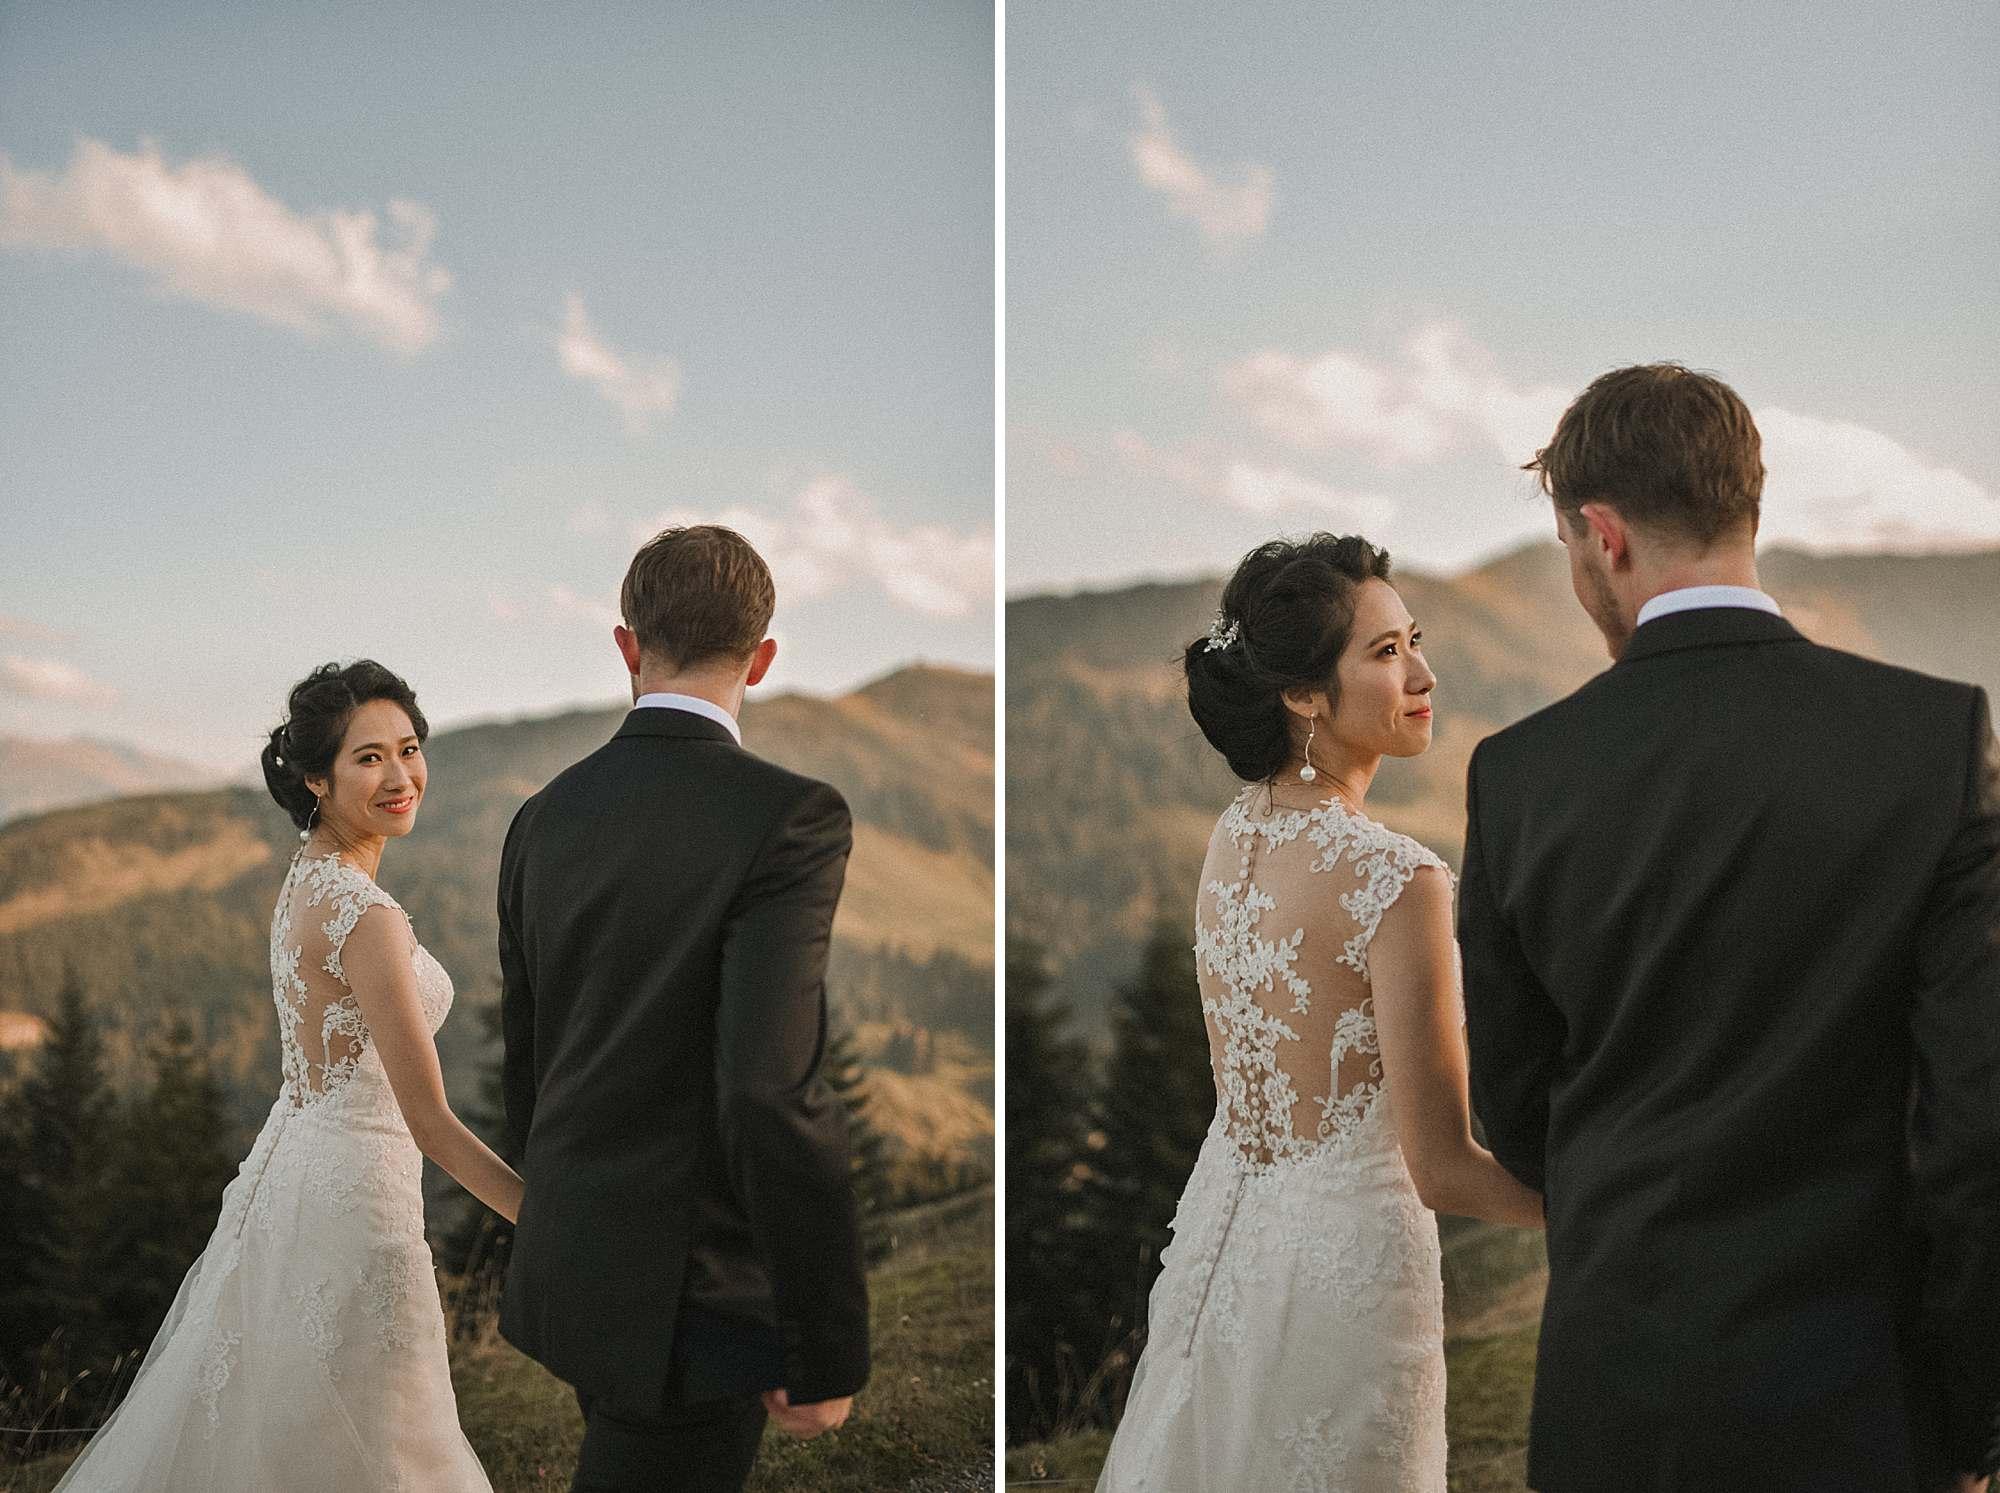 kitzbuehel wedding photographer_0075.jpg